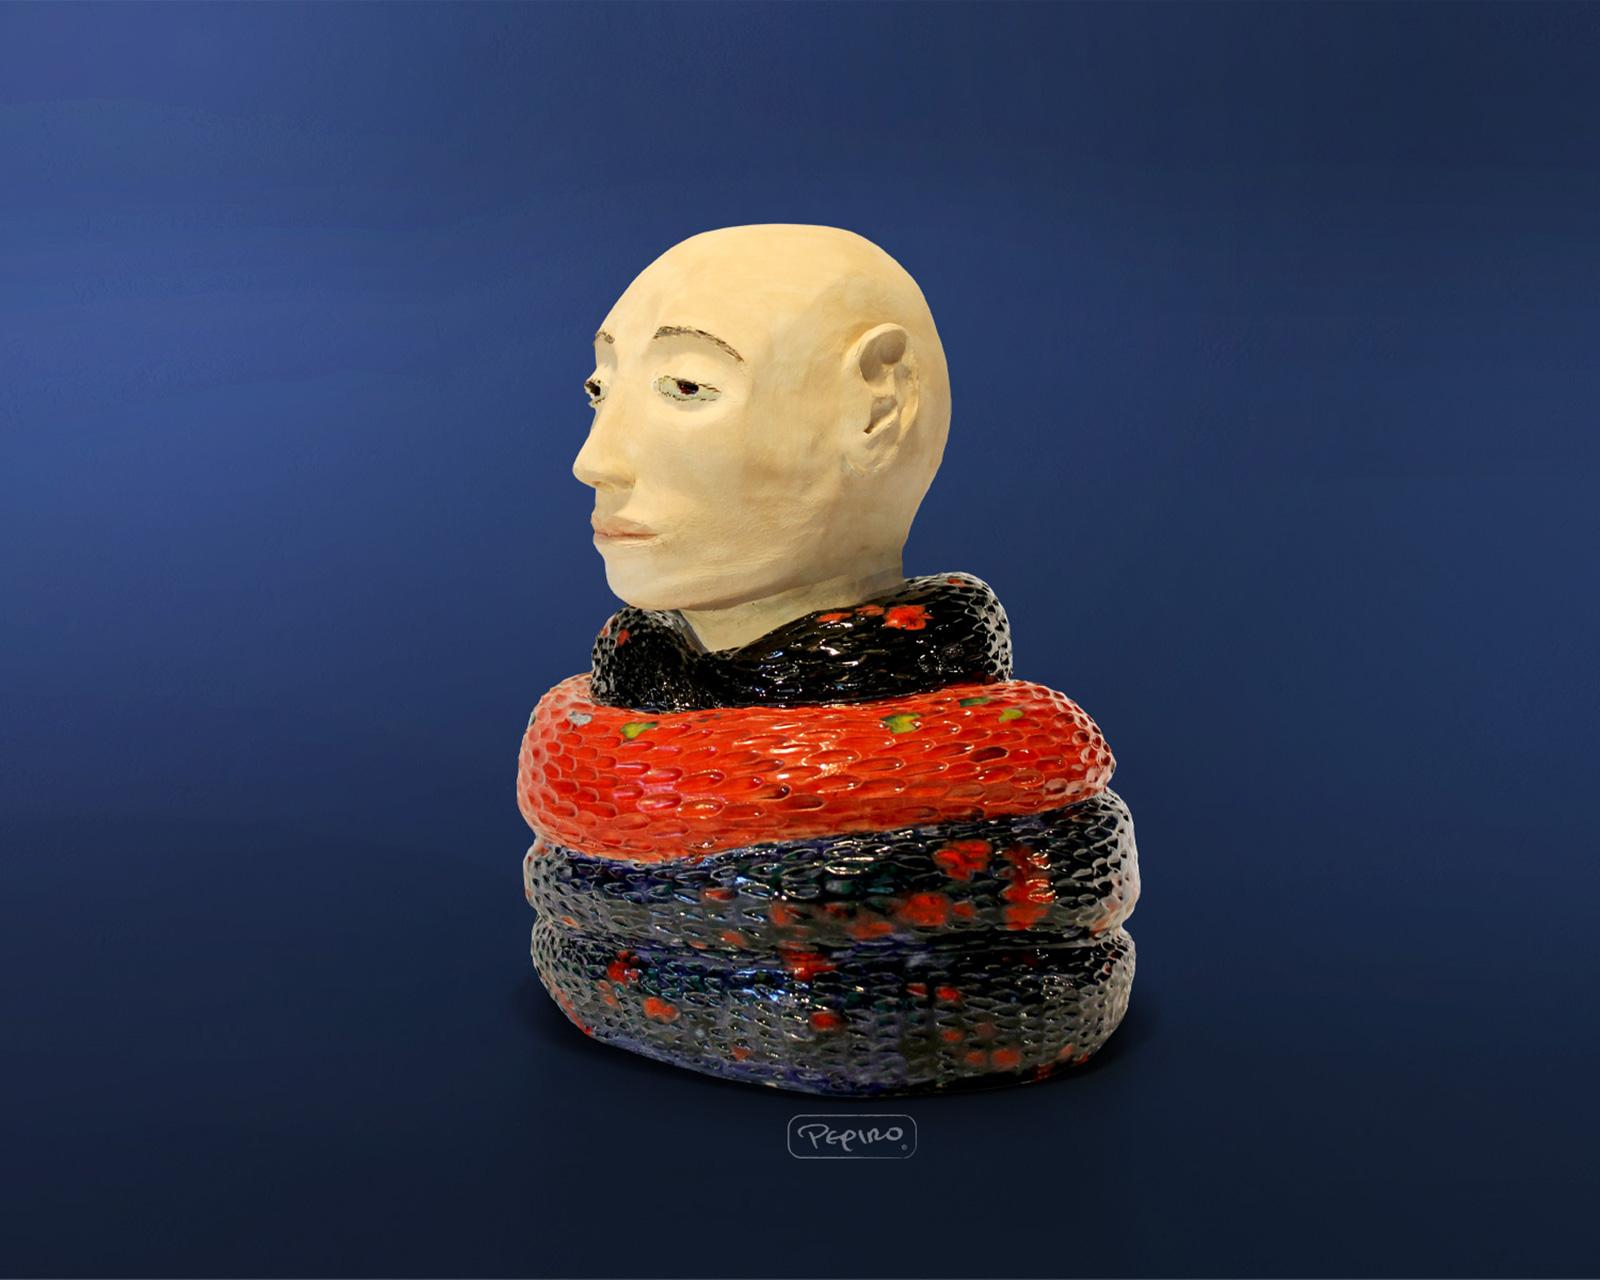 pepiro_van_roncha ceramic piece 'Nagarjuna'